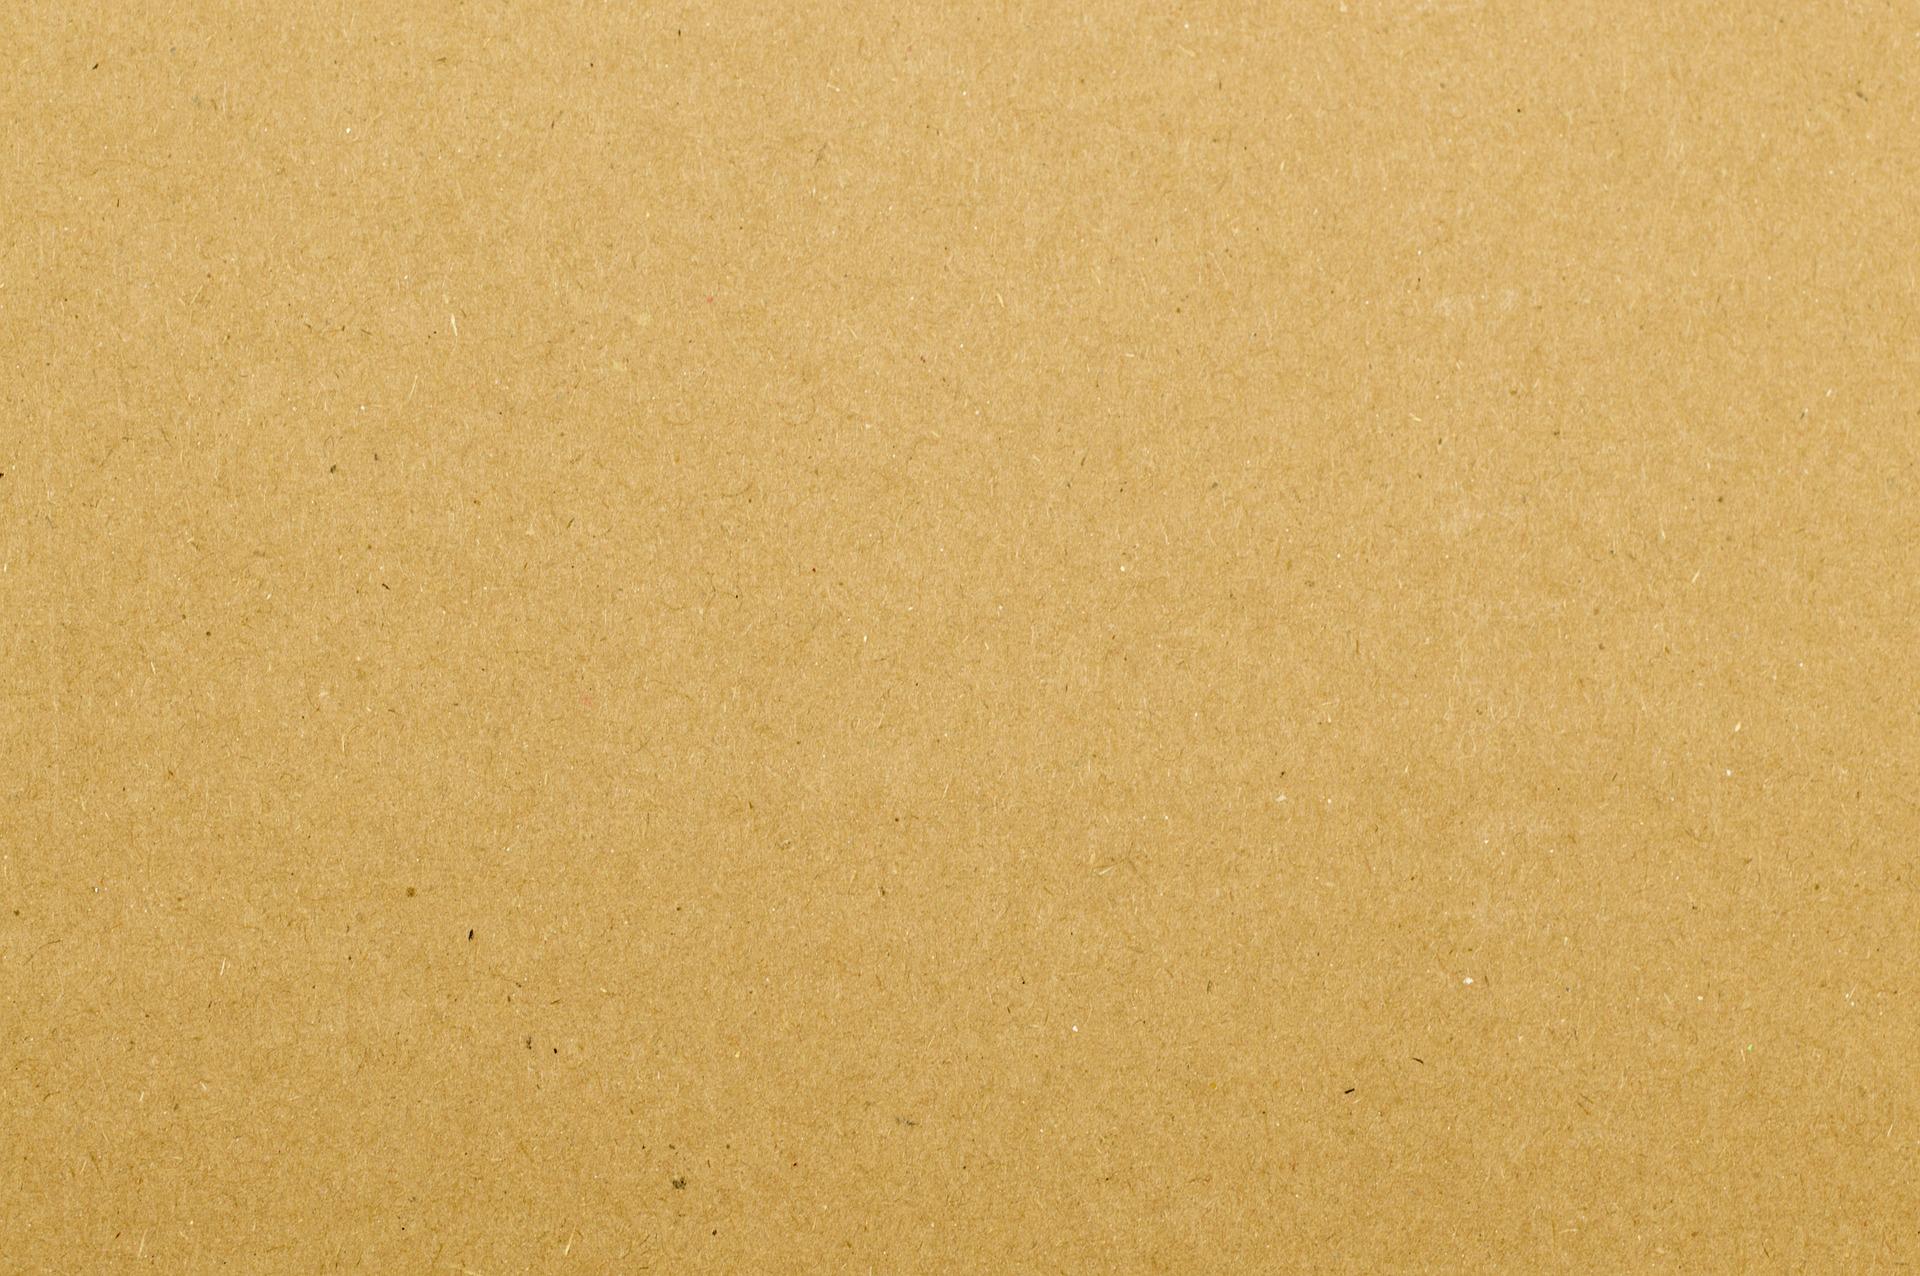 cardboard-546867_1920